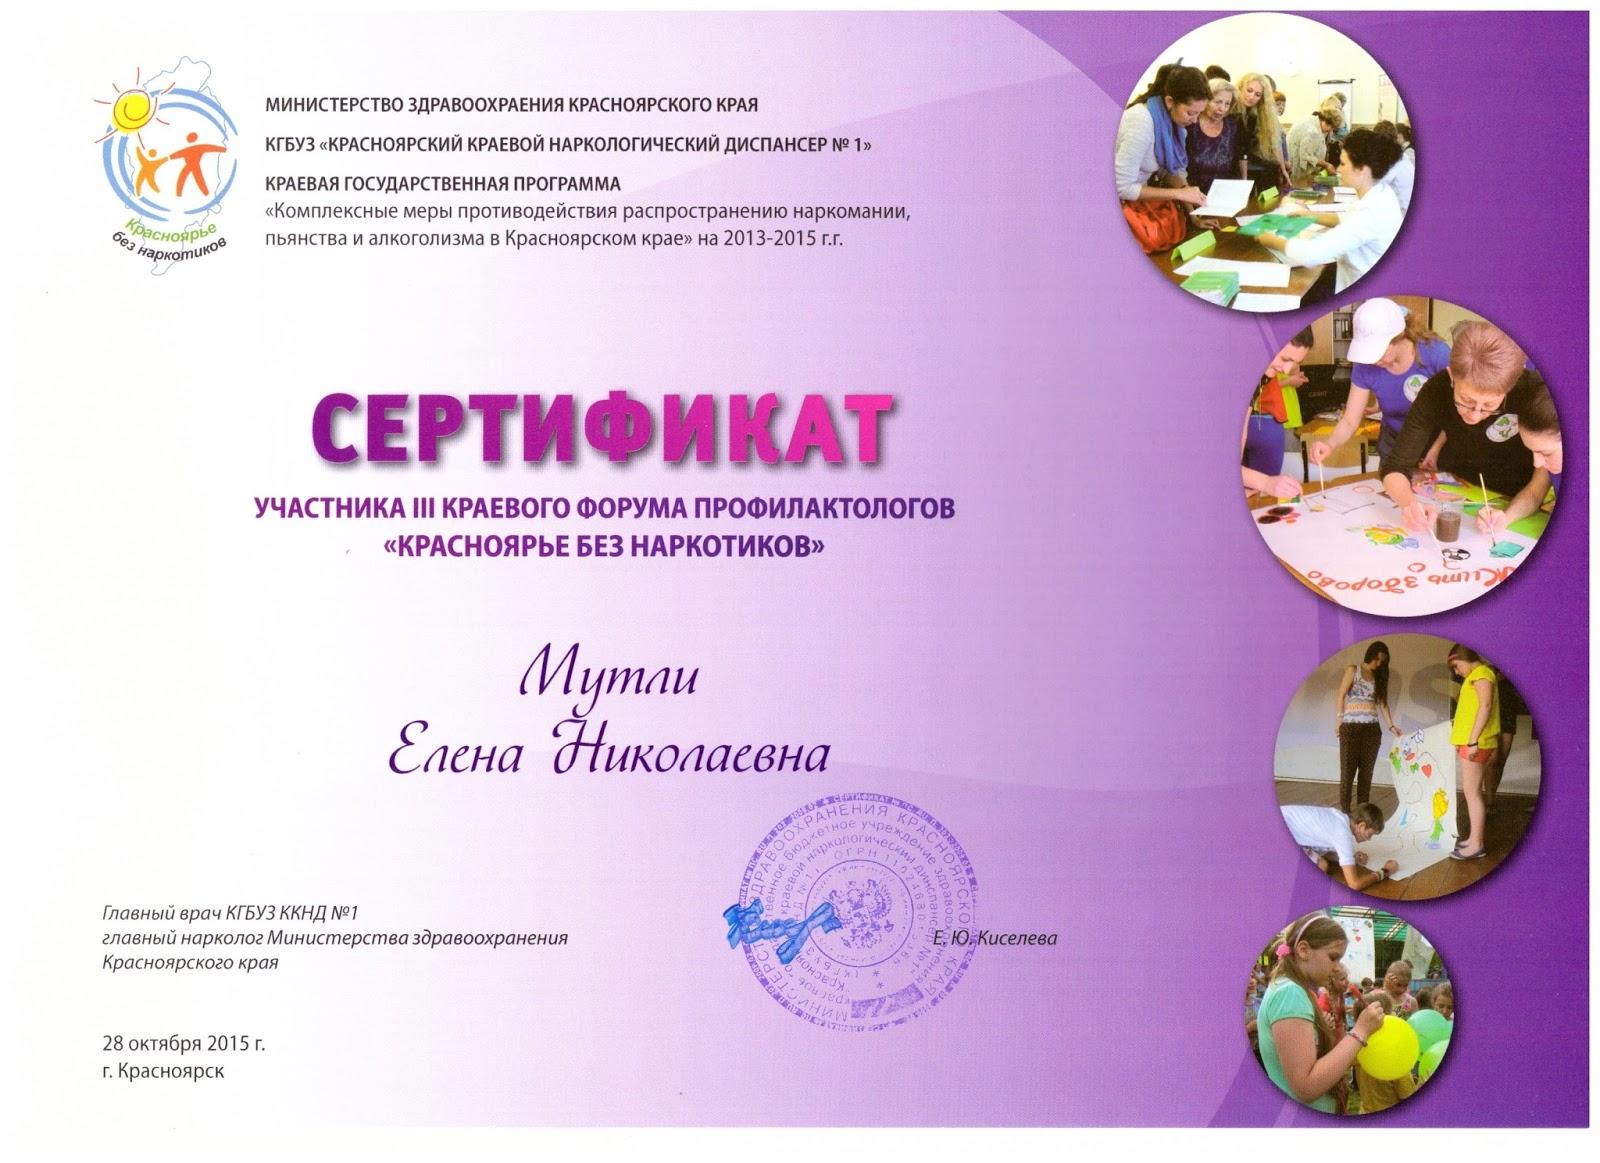 Сертификат профилактолога